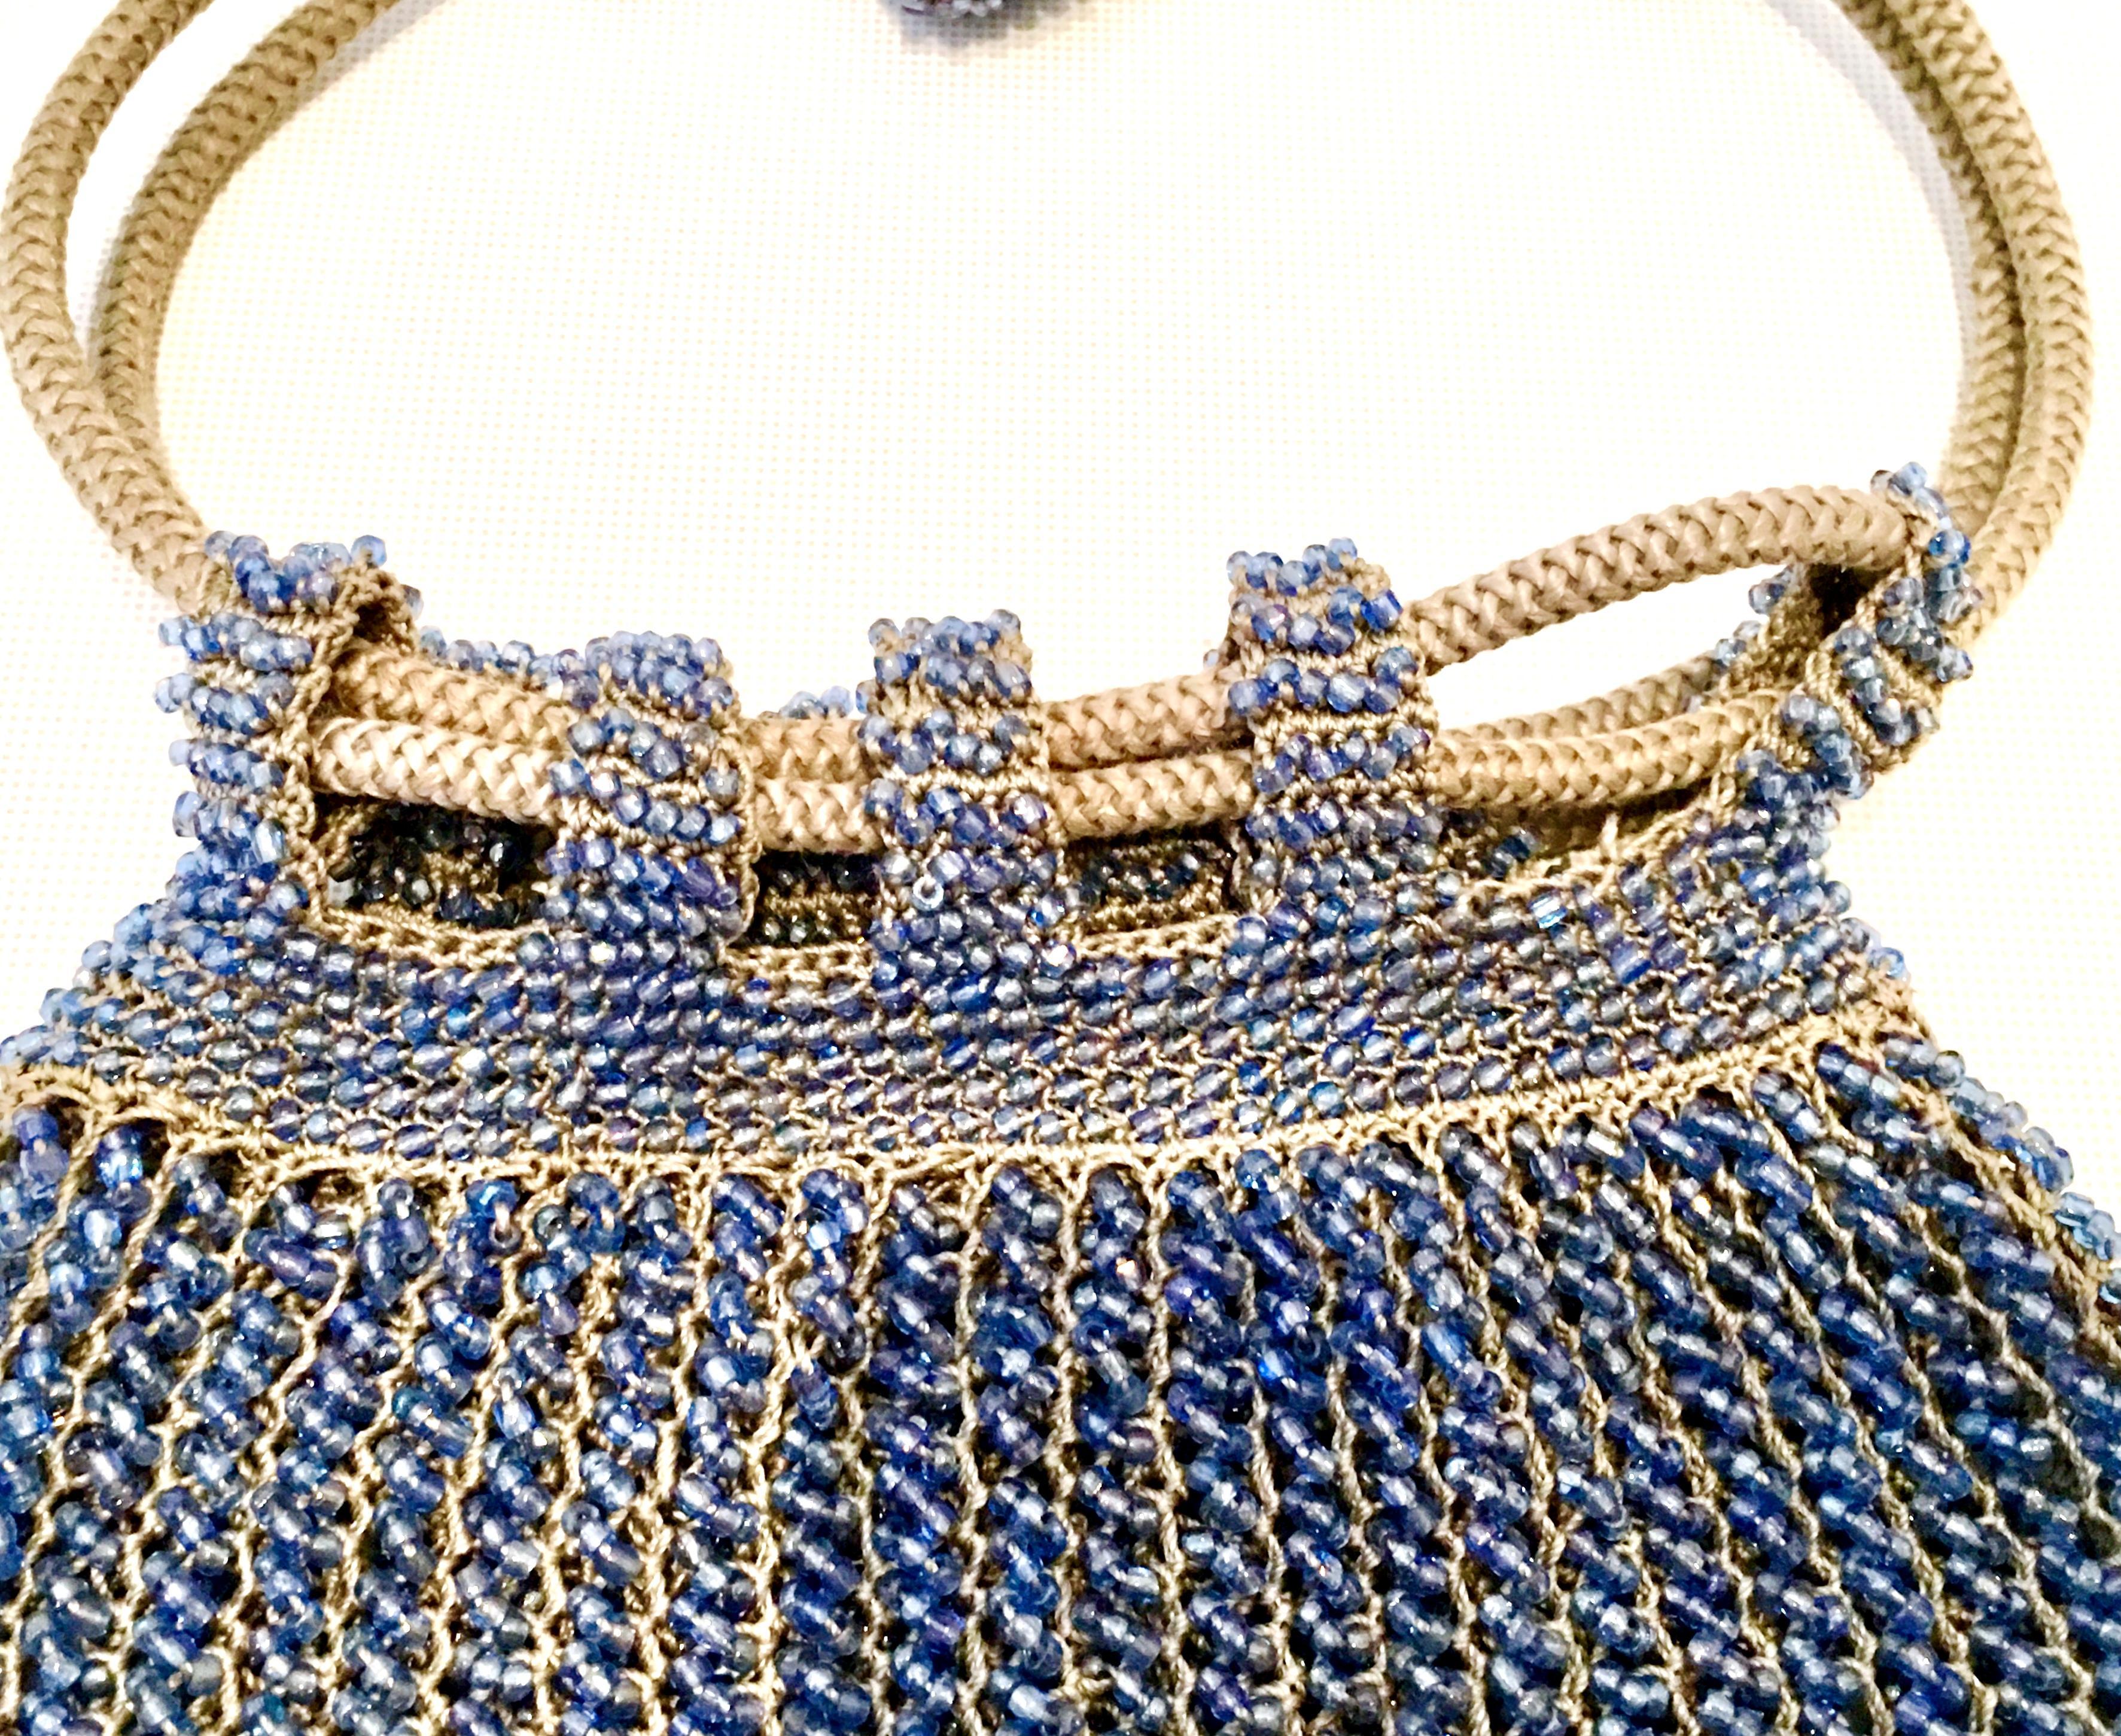 Antiques Buy Cheap Antique Crochet Purple Iridescent Bead Ball Tassel Chain Handle Flapper Purse Clothing, Shoes & Accessories